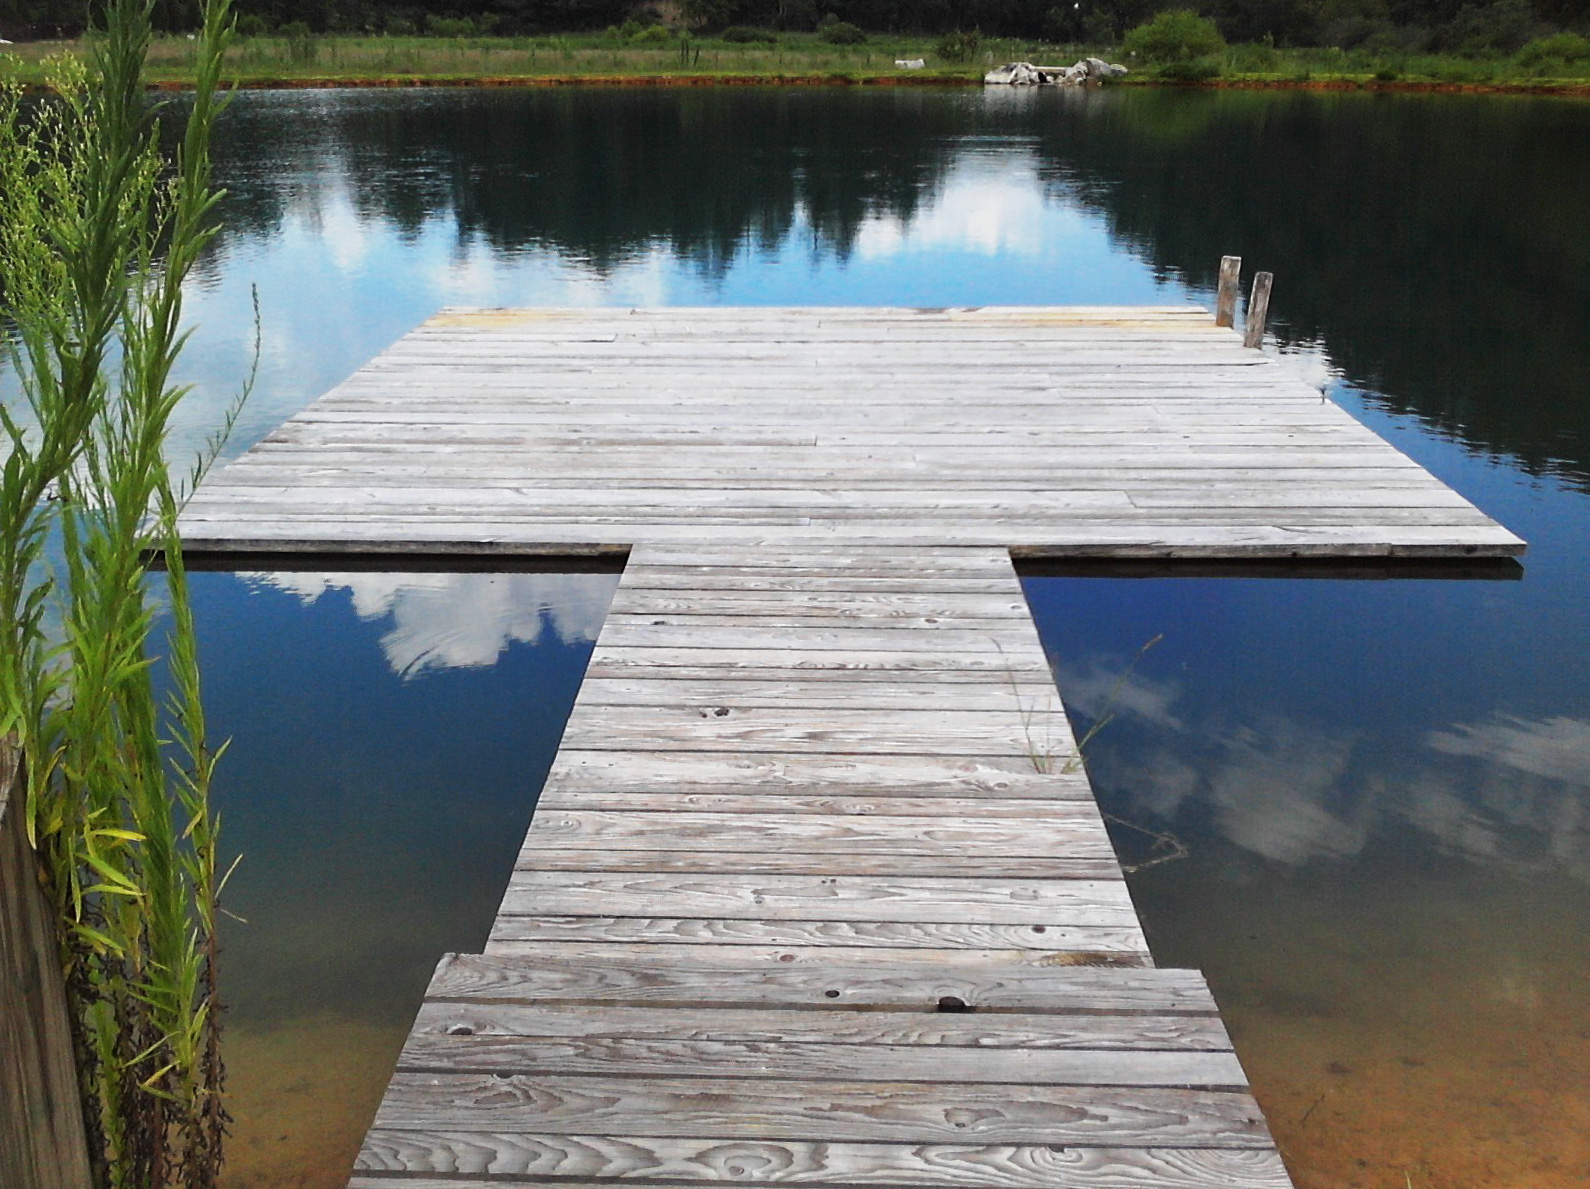 Dock on the Pond Pure Water Farm near Gatlinburg TN